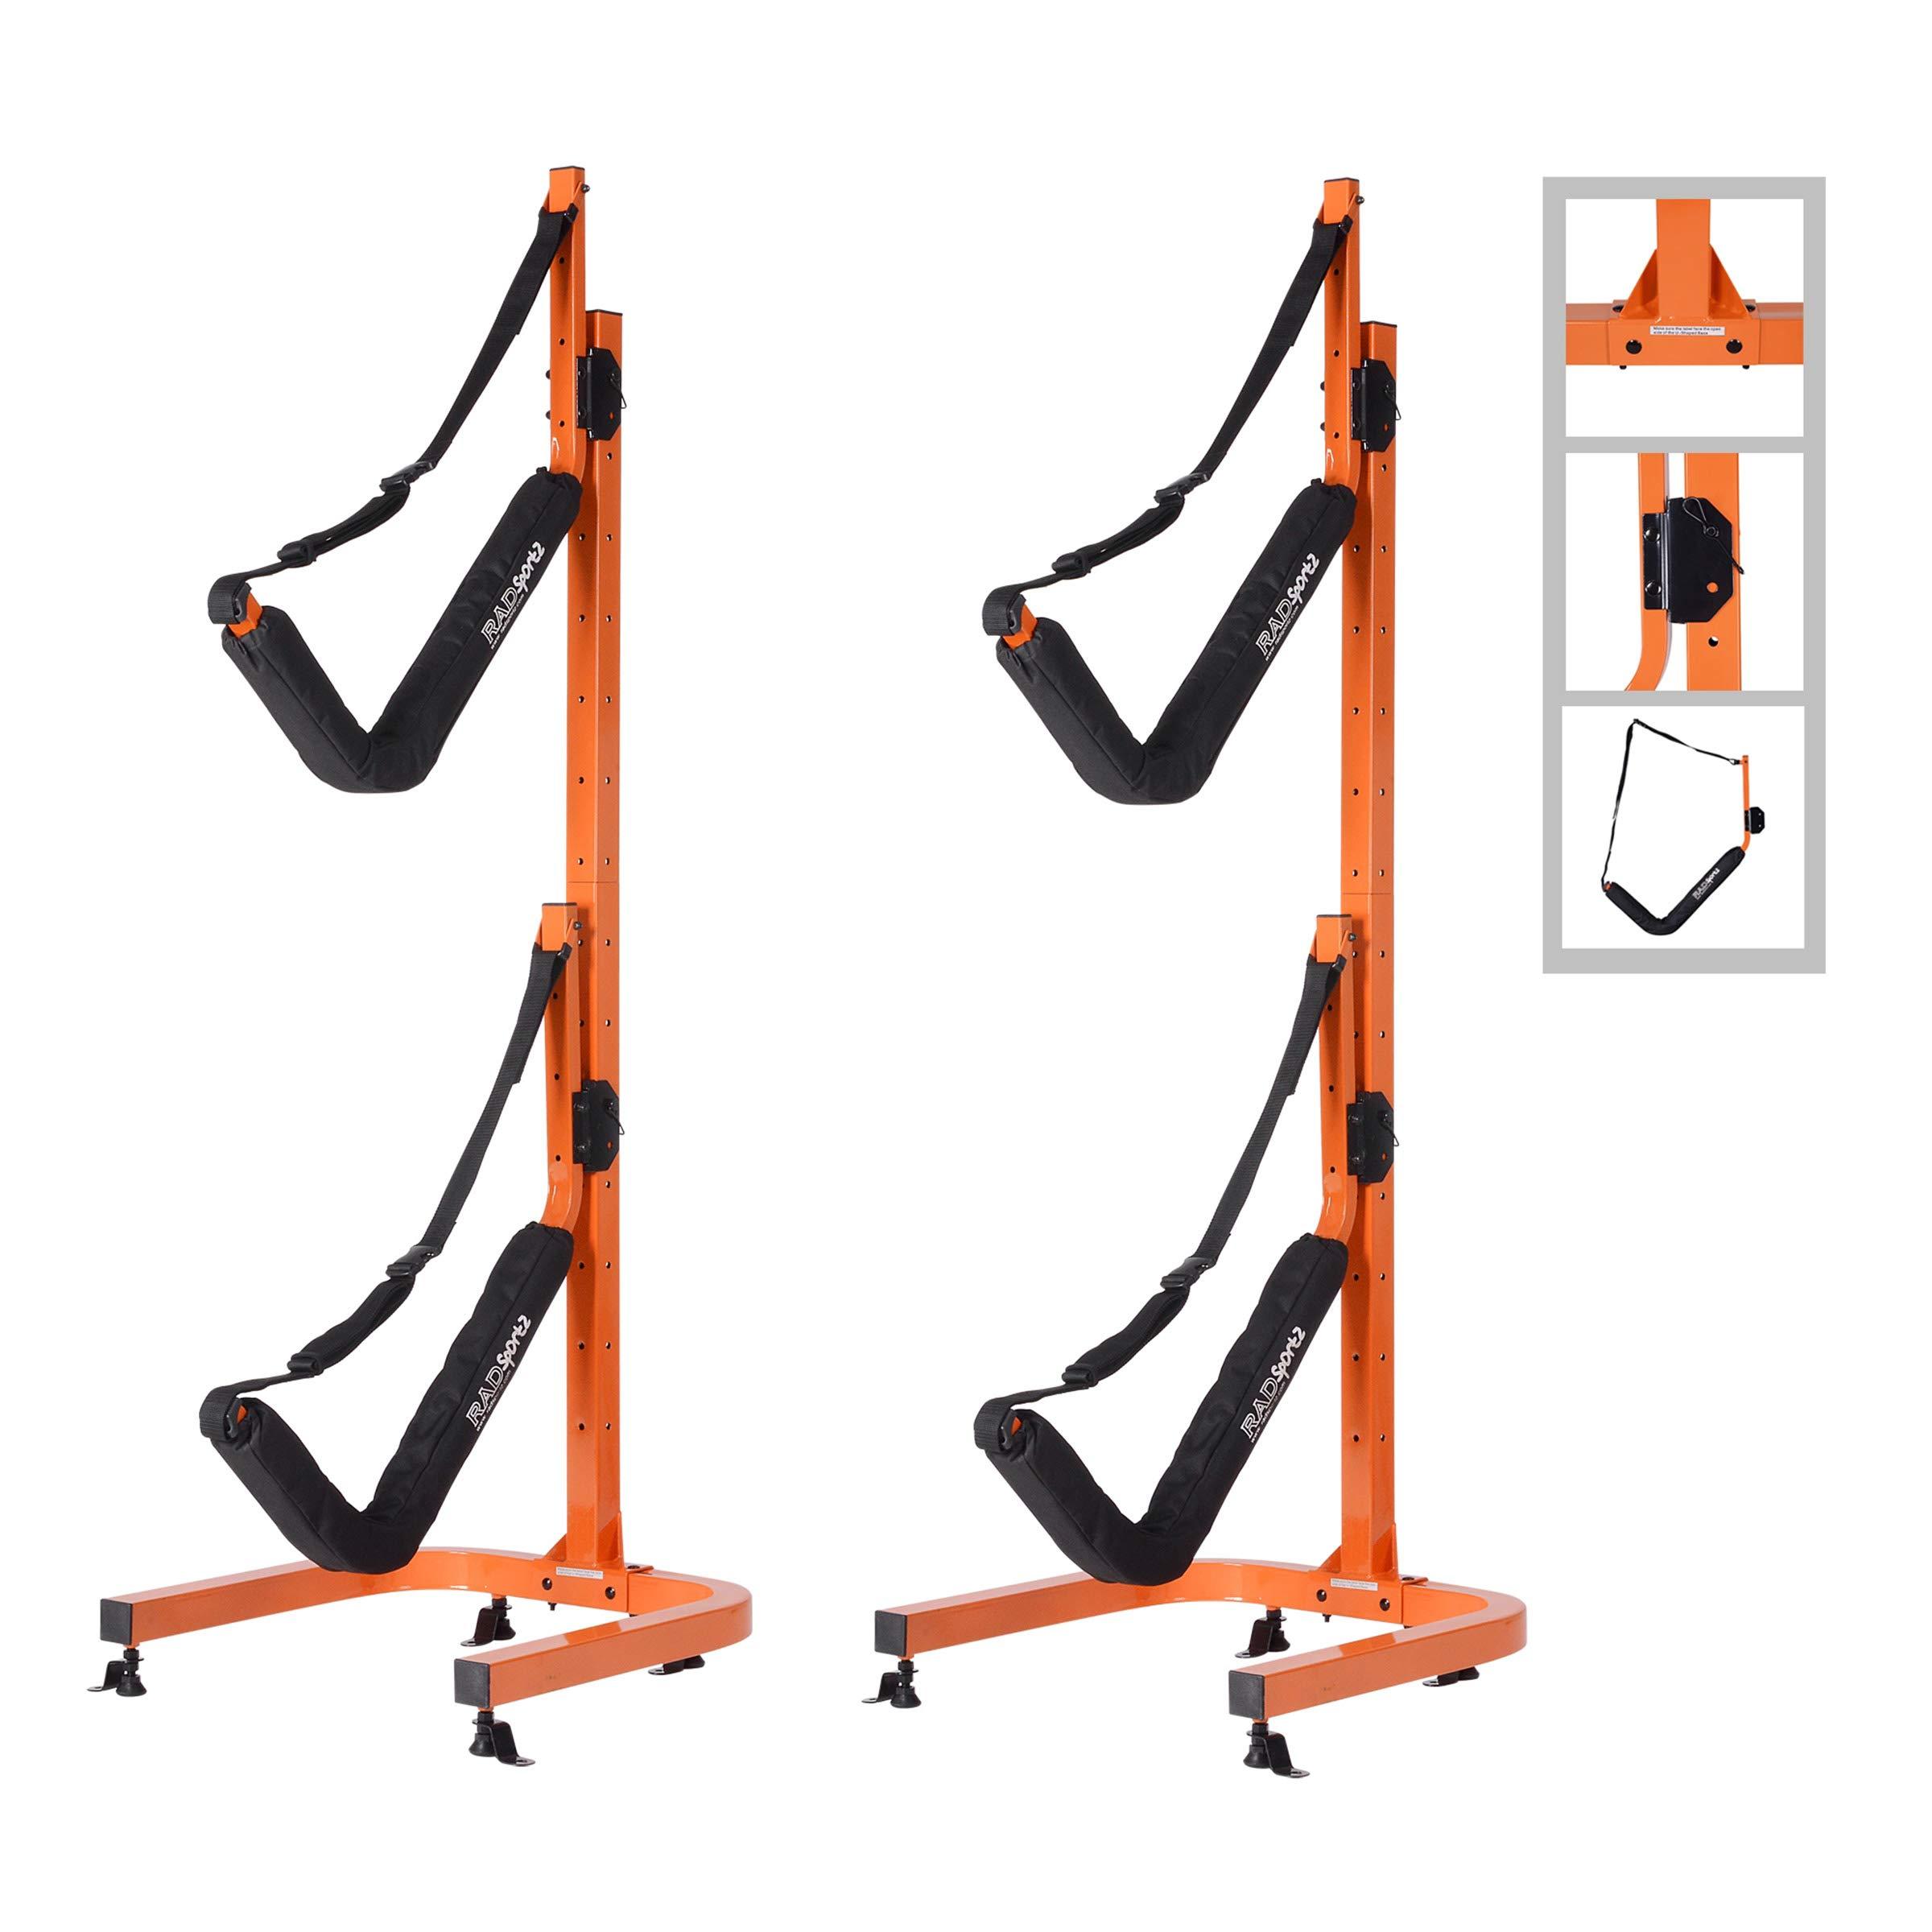 RAD Sportz Double Kayak Storage Rack- Self Standing Dual Canoe Kayak Cradle Set with Adjustable Safety Strap System for Outdoor Indoor Use by RAD Sportz